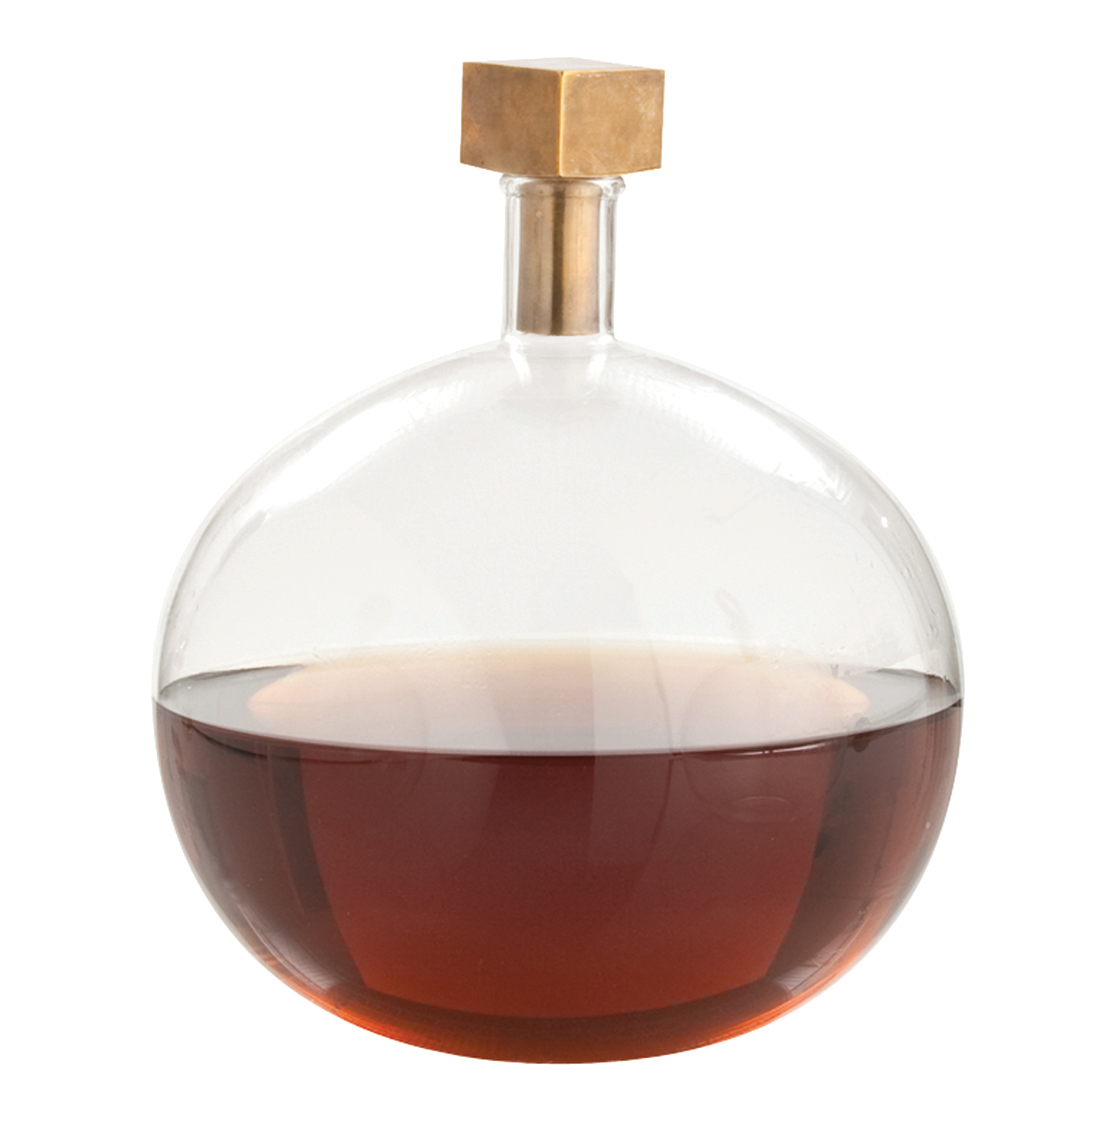 Edgar Round Modern Glass Square Brass Stopper Decanter